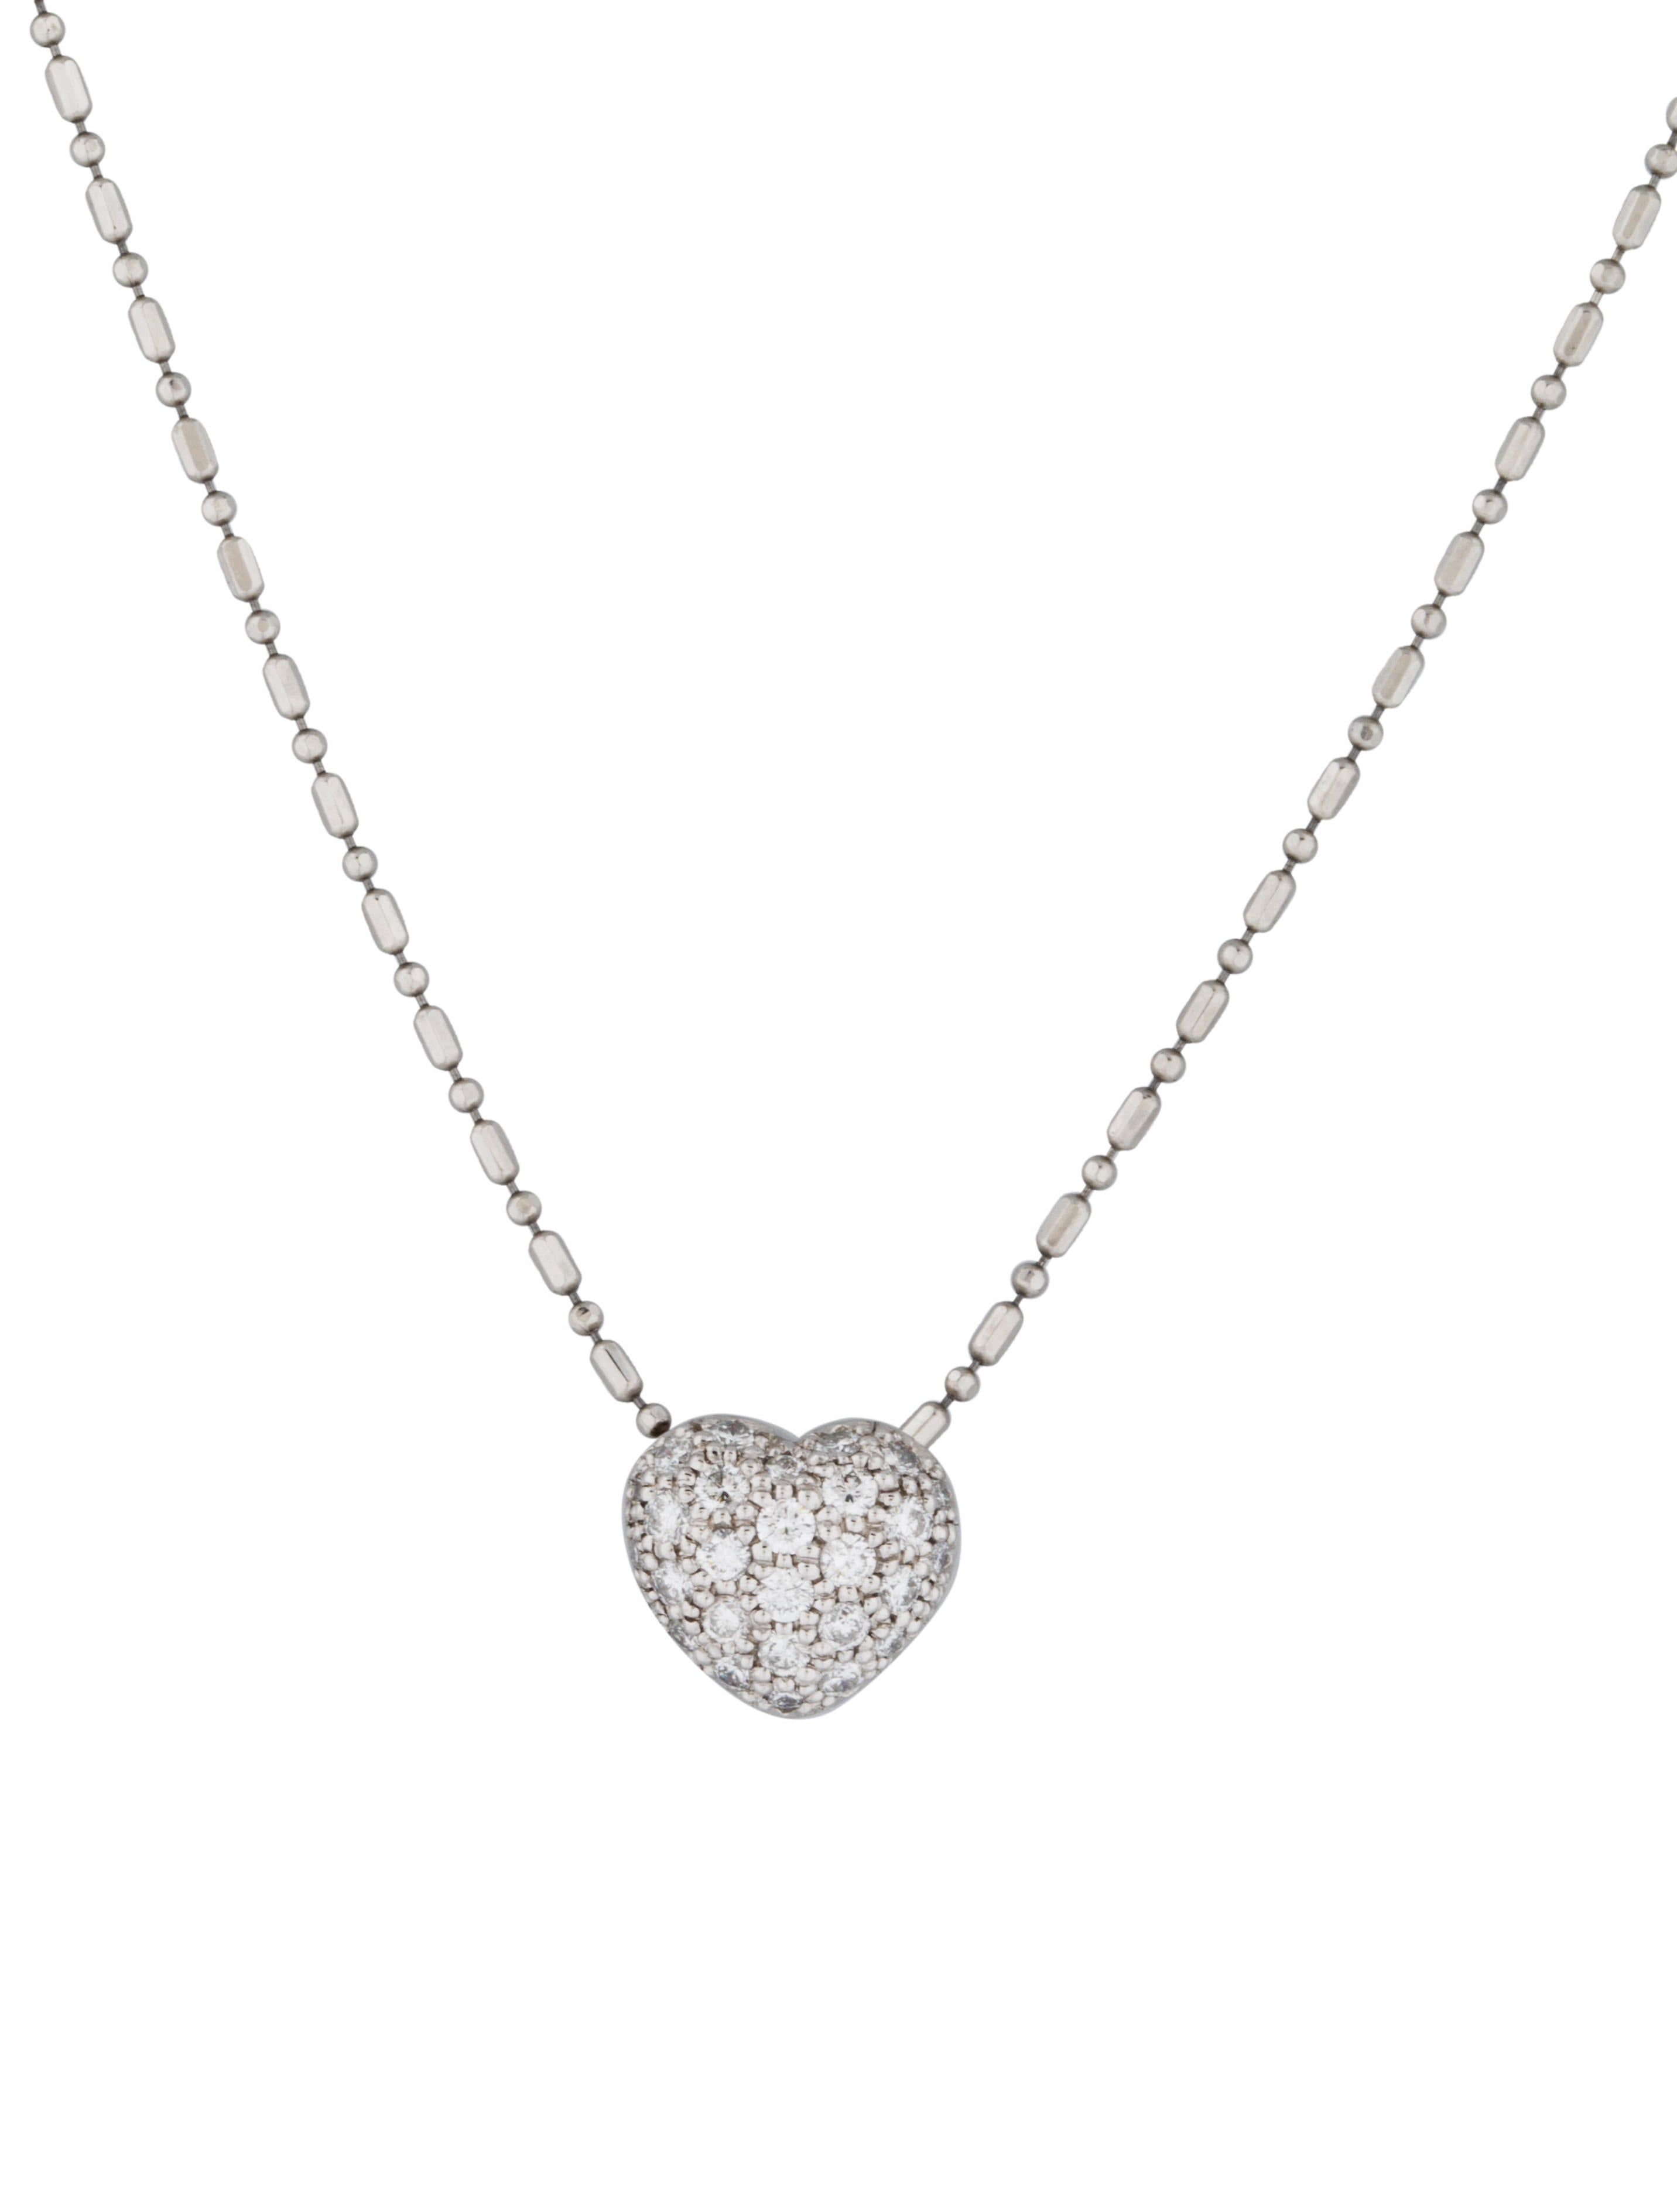 pave heart pendant necklace necklaces neckl21560 the. Black Bedroom Furniture Sets. Home Design Ideas